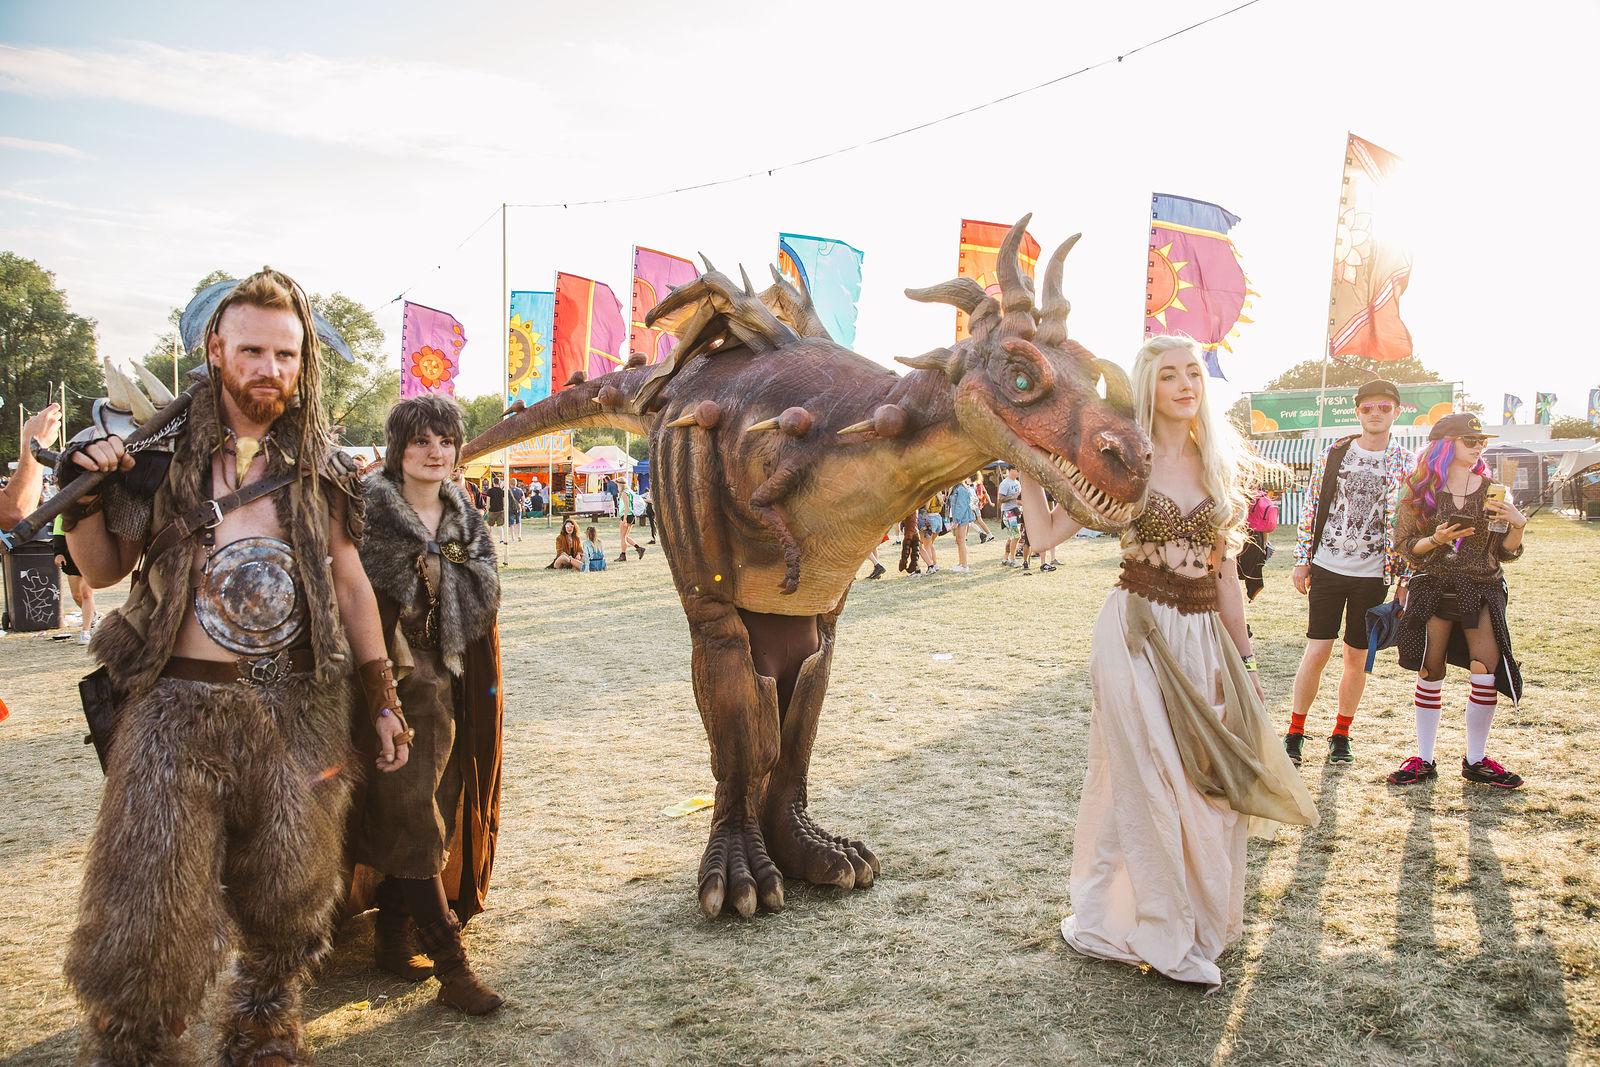 Khaleesi and the Dragon